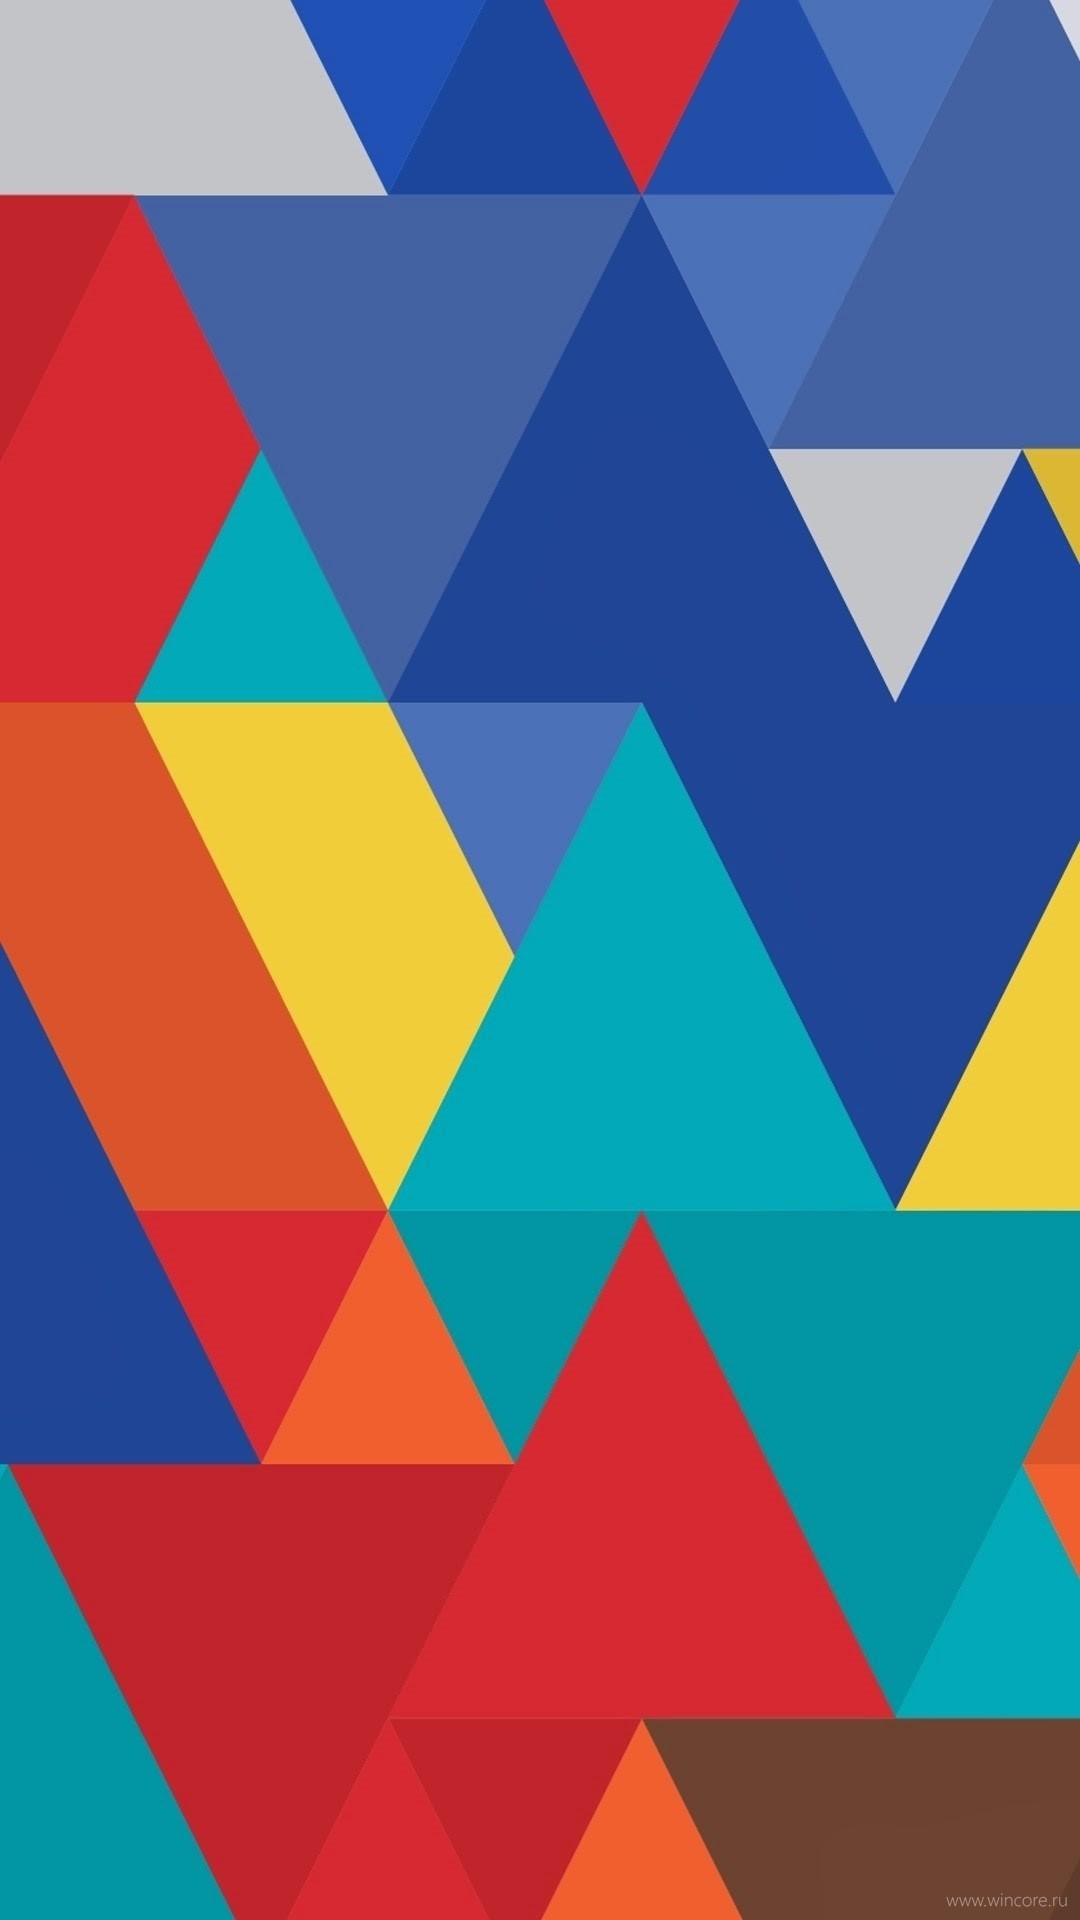 Geometric hd wallpaper for mobile